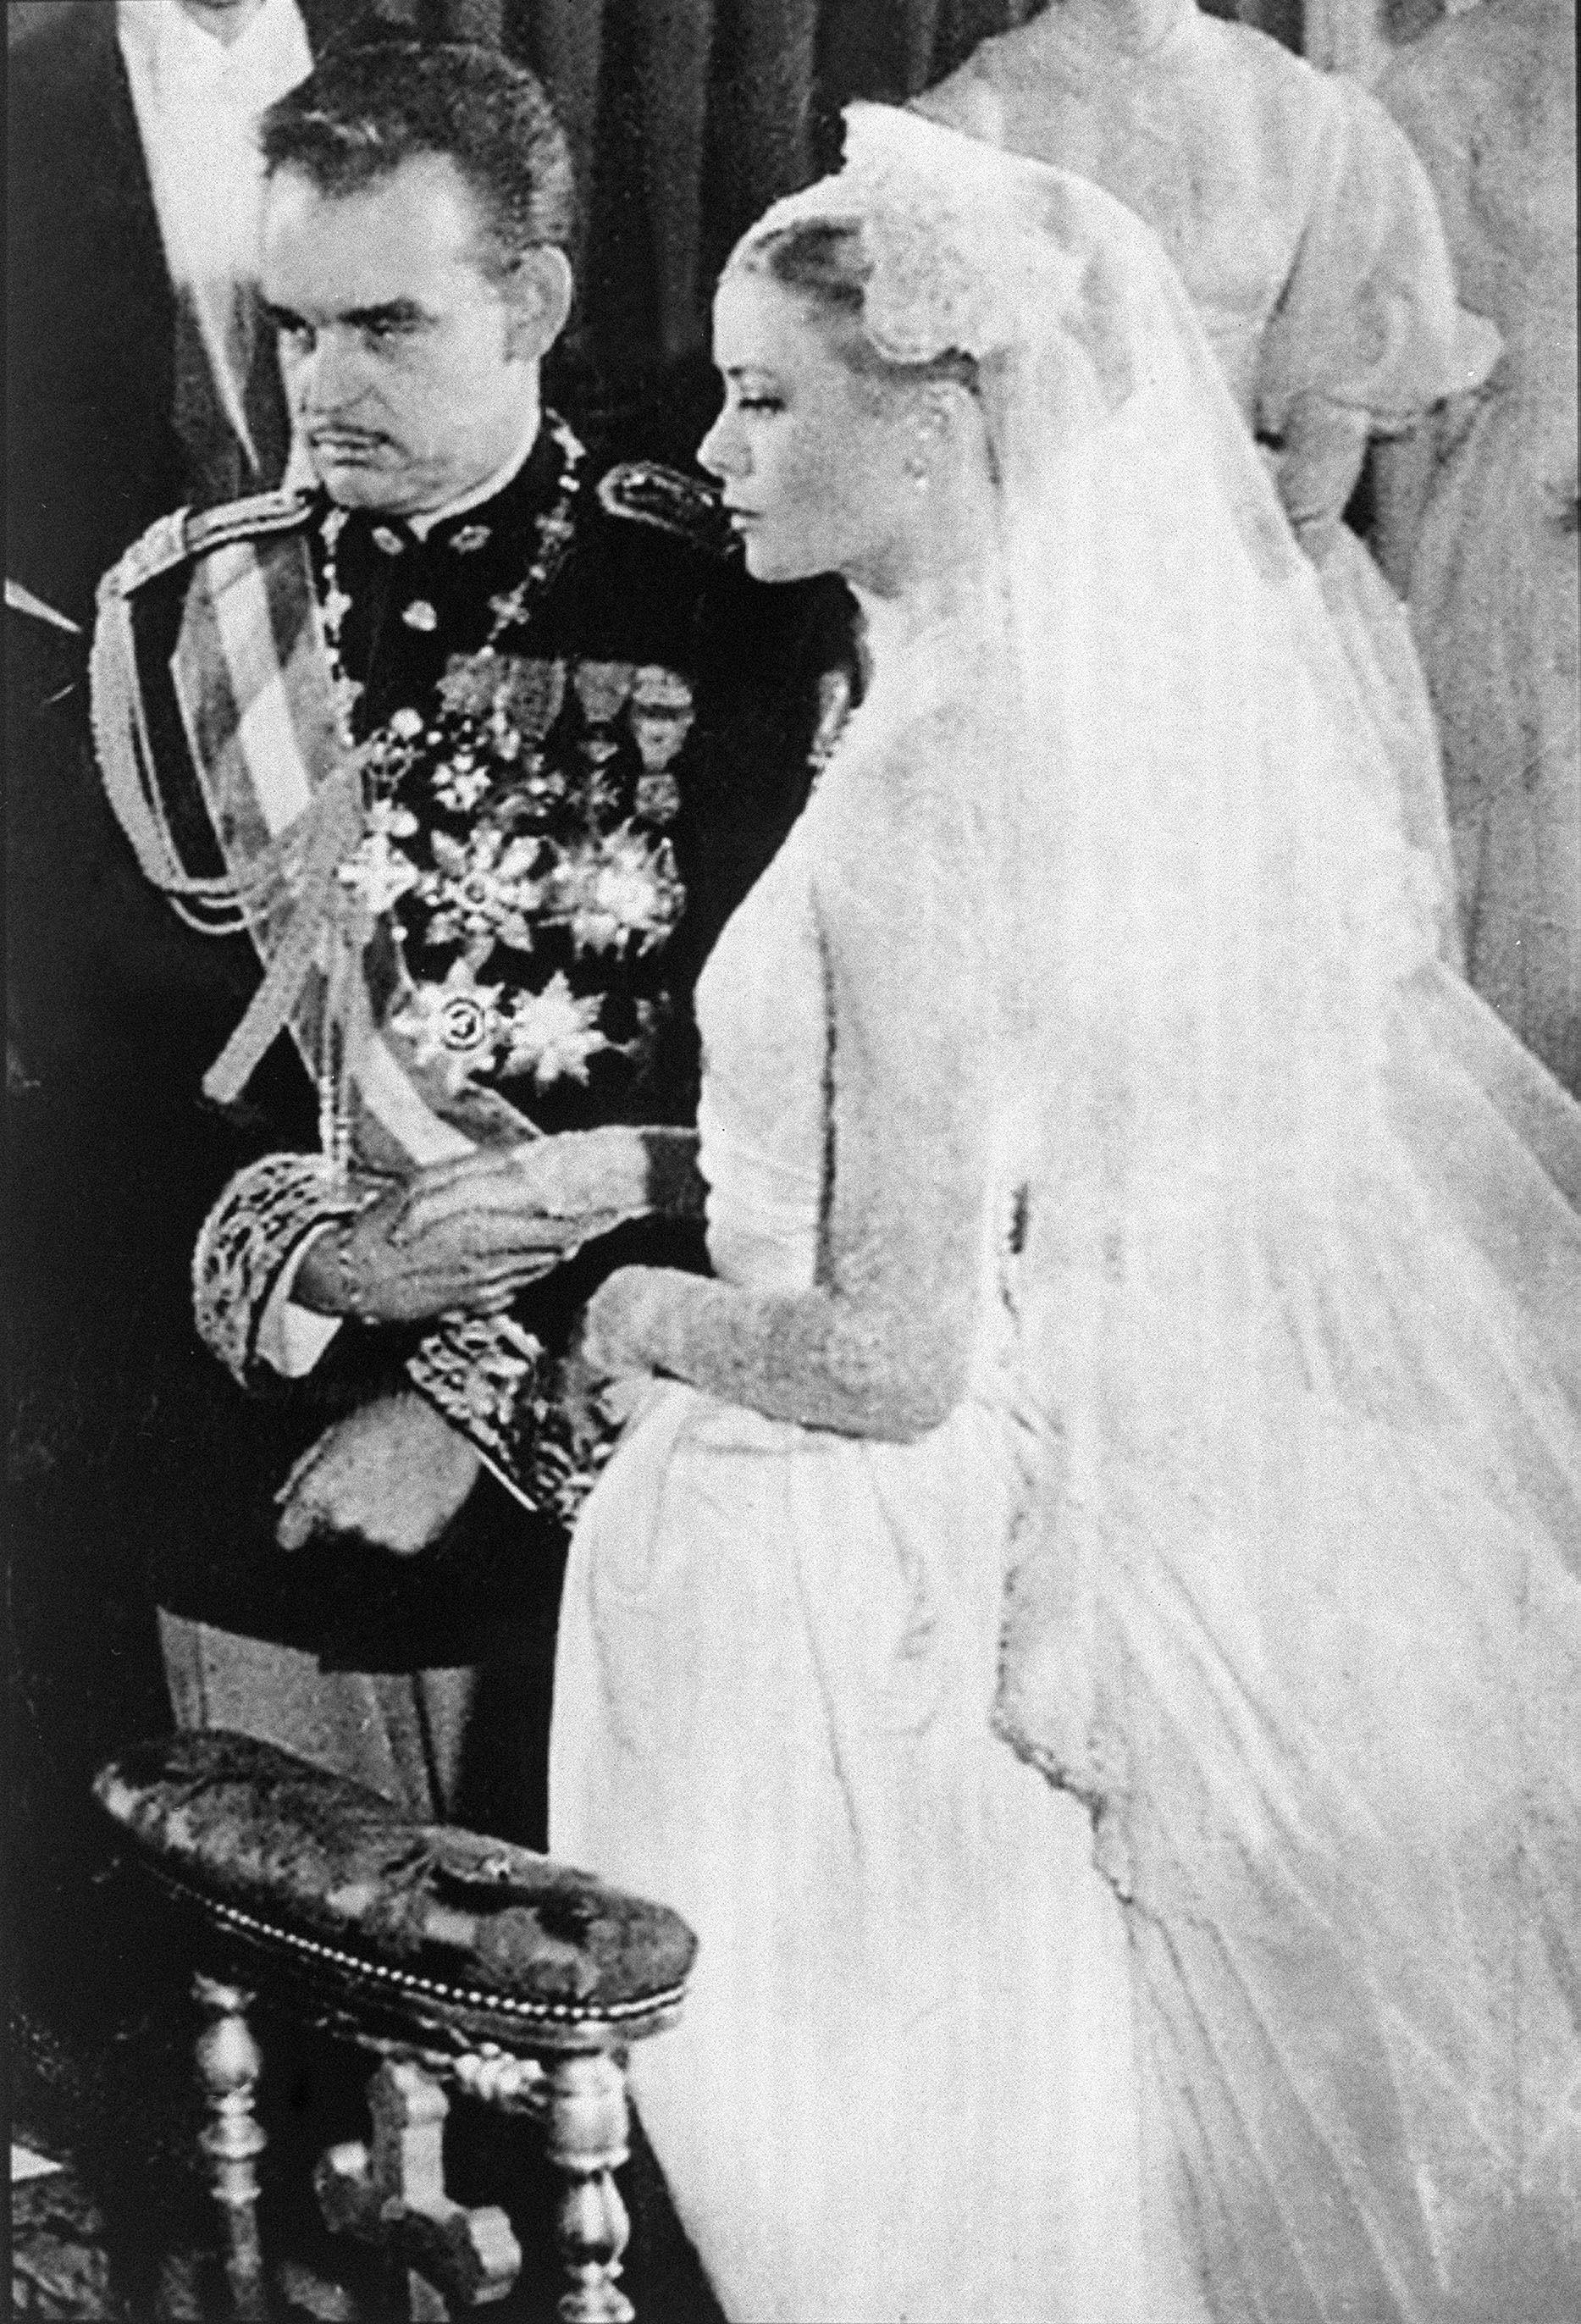 princess grace of monaco wedding - Google Search   Wedding ...